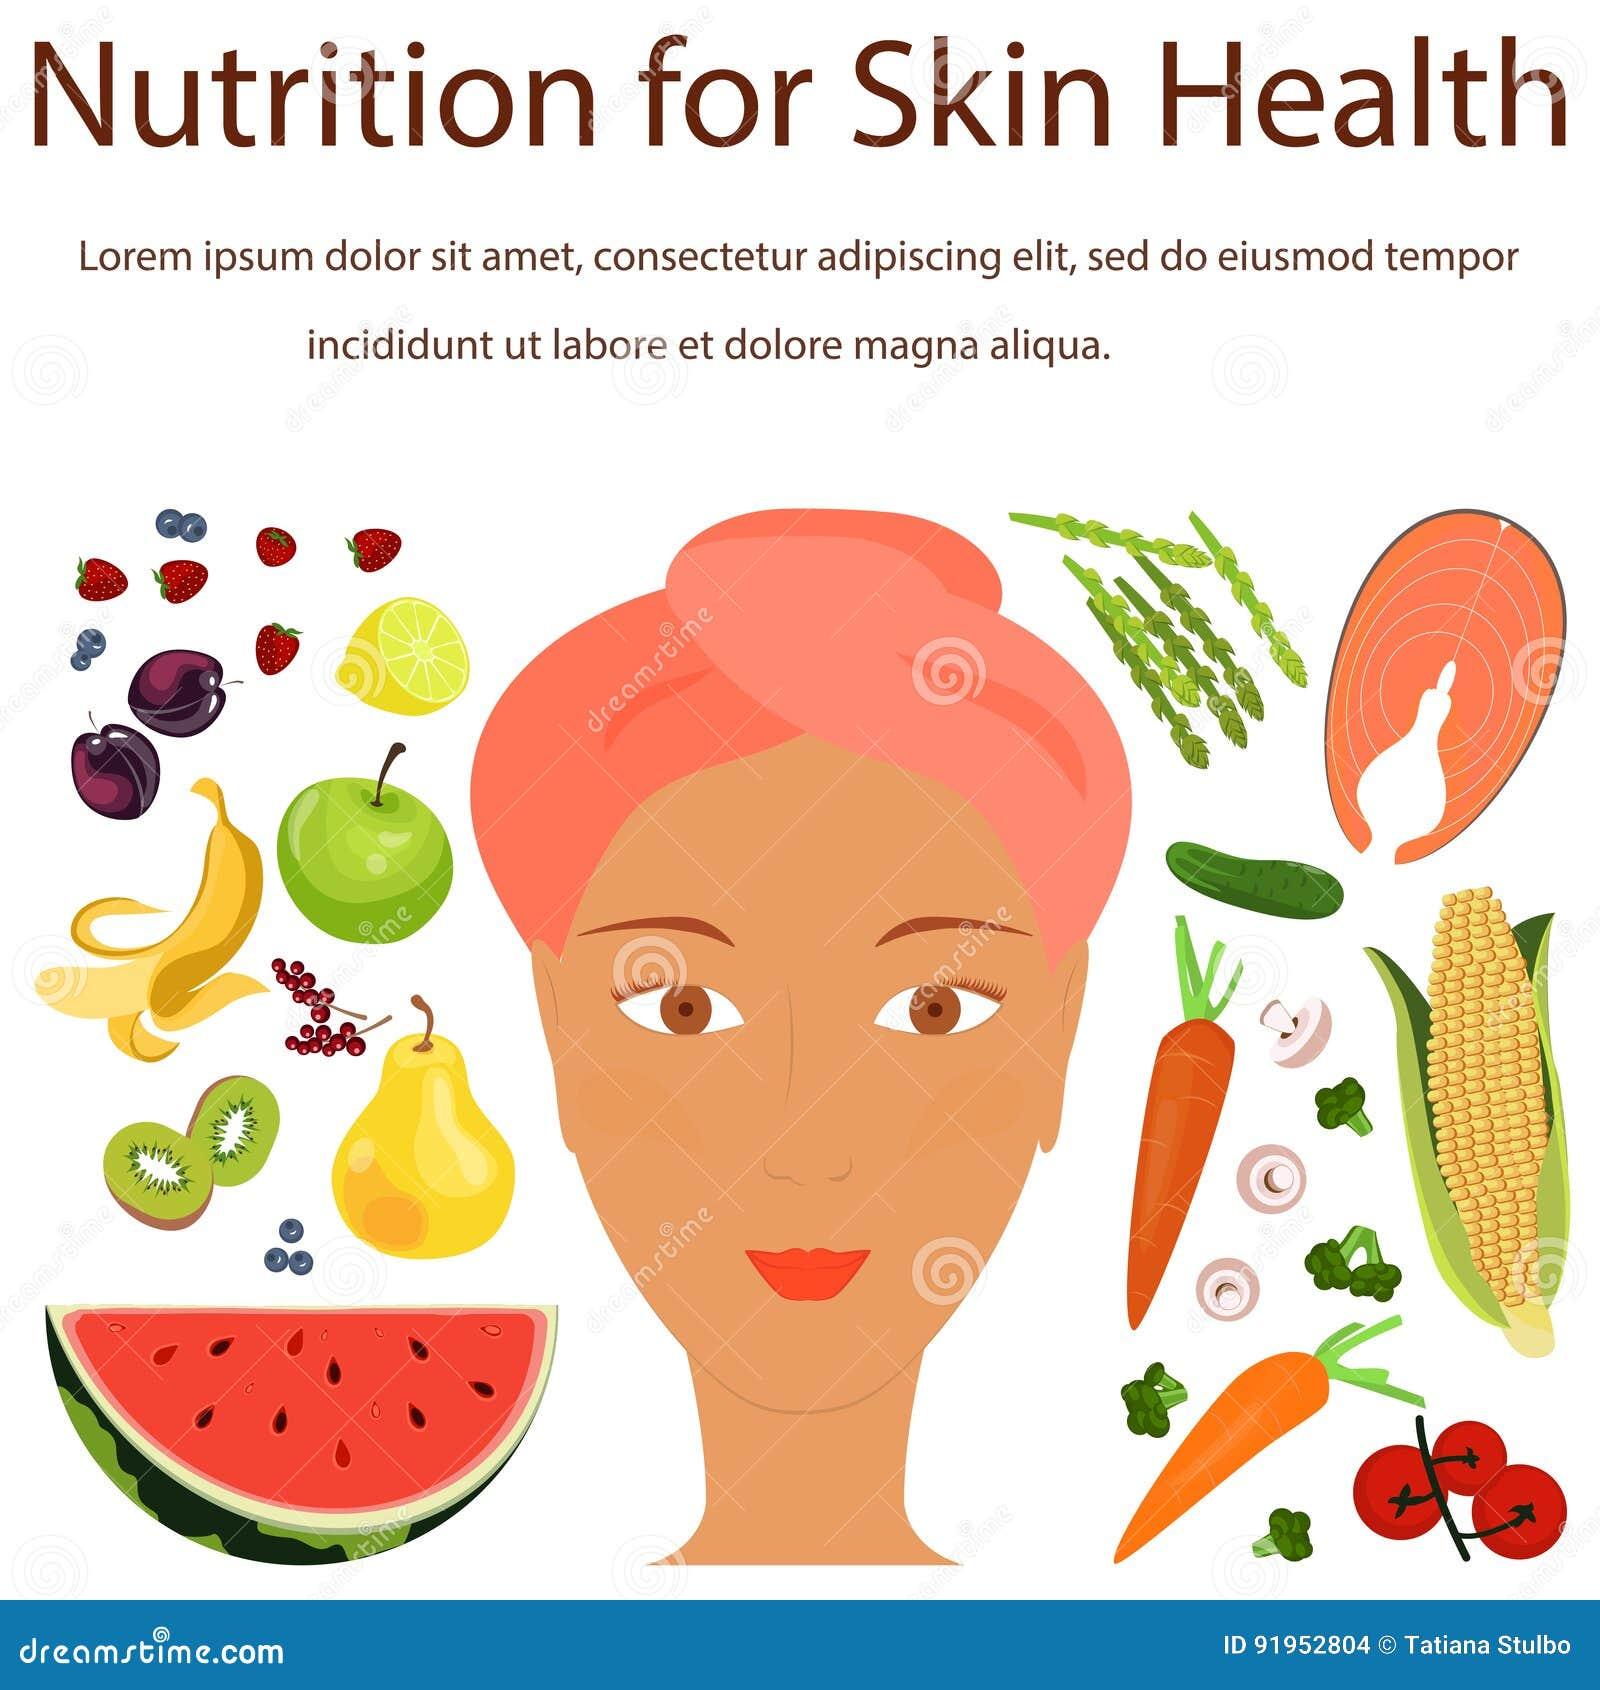 Foods That Benefit Healthy Skin